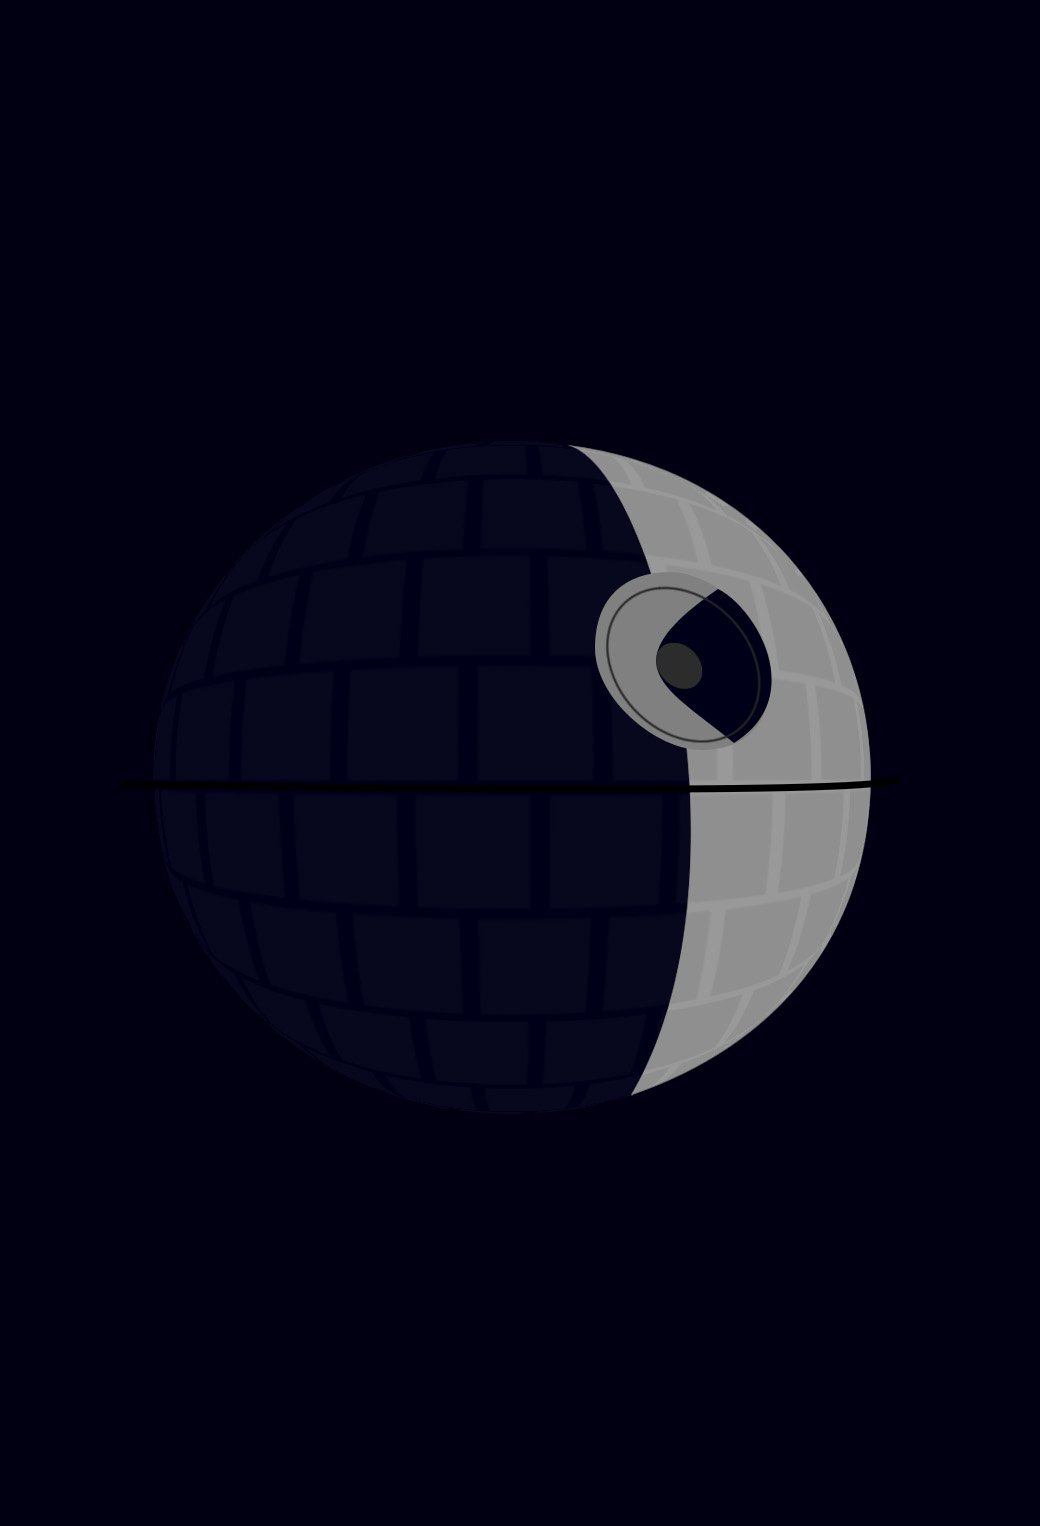 Free Download Geek Art Gallery Crafts Star Wars X Mas